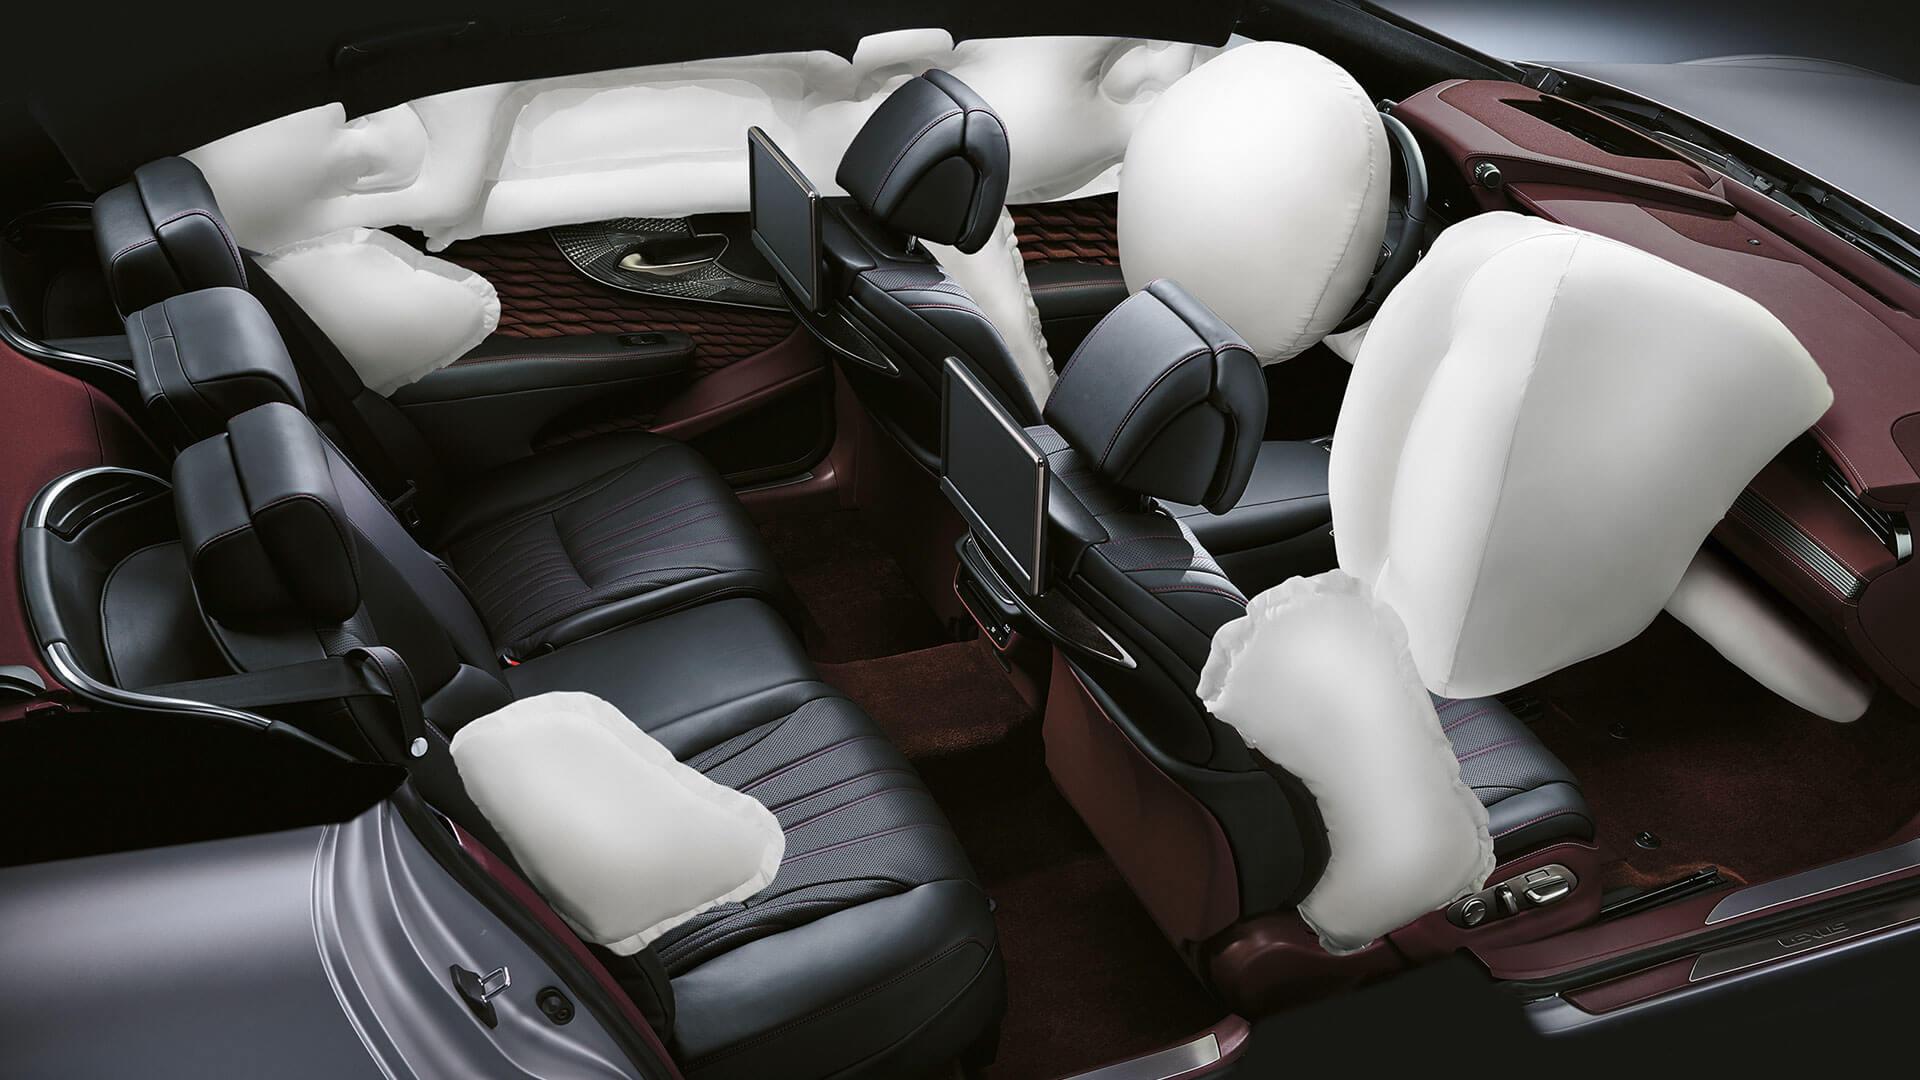 2018 lexus ls features fourteen airbags